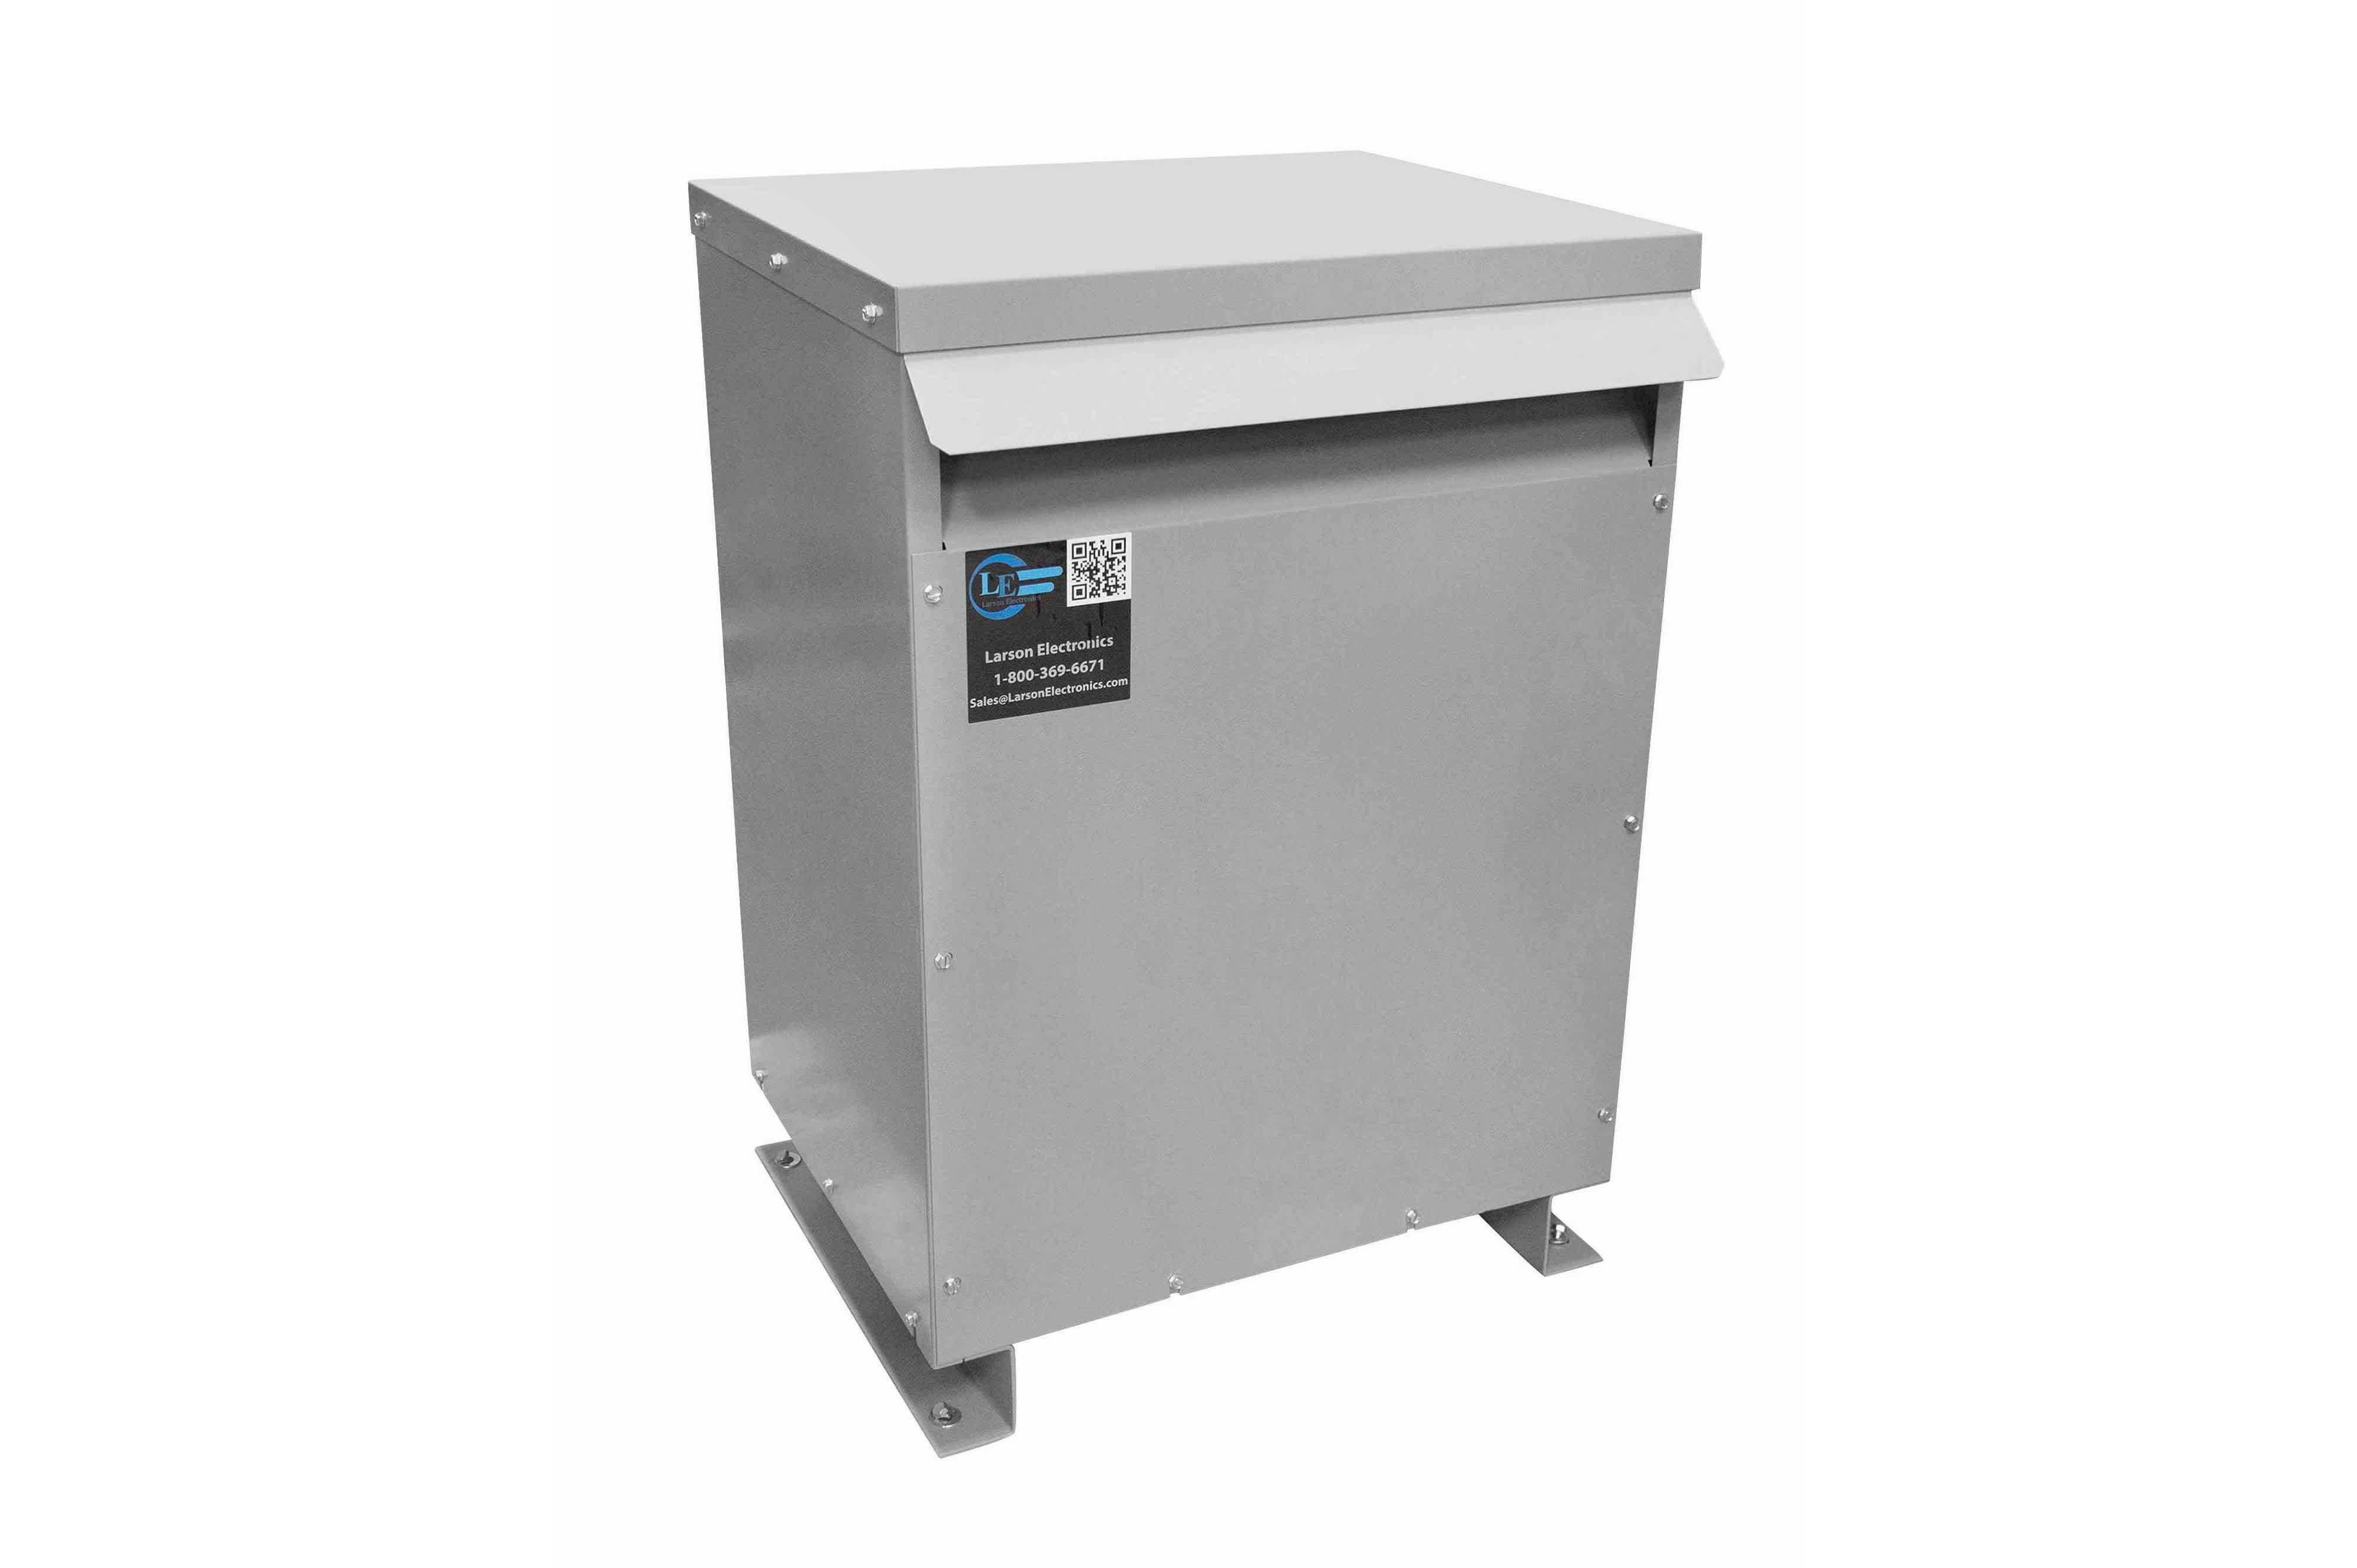 38 kVA 3PH Isolation Transformer, 440V Wye Primary, 240V/120 Delta Secondary, N3R, Ventilated, 60 Hz